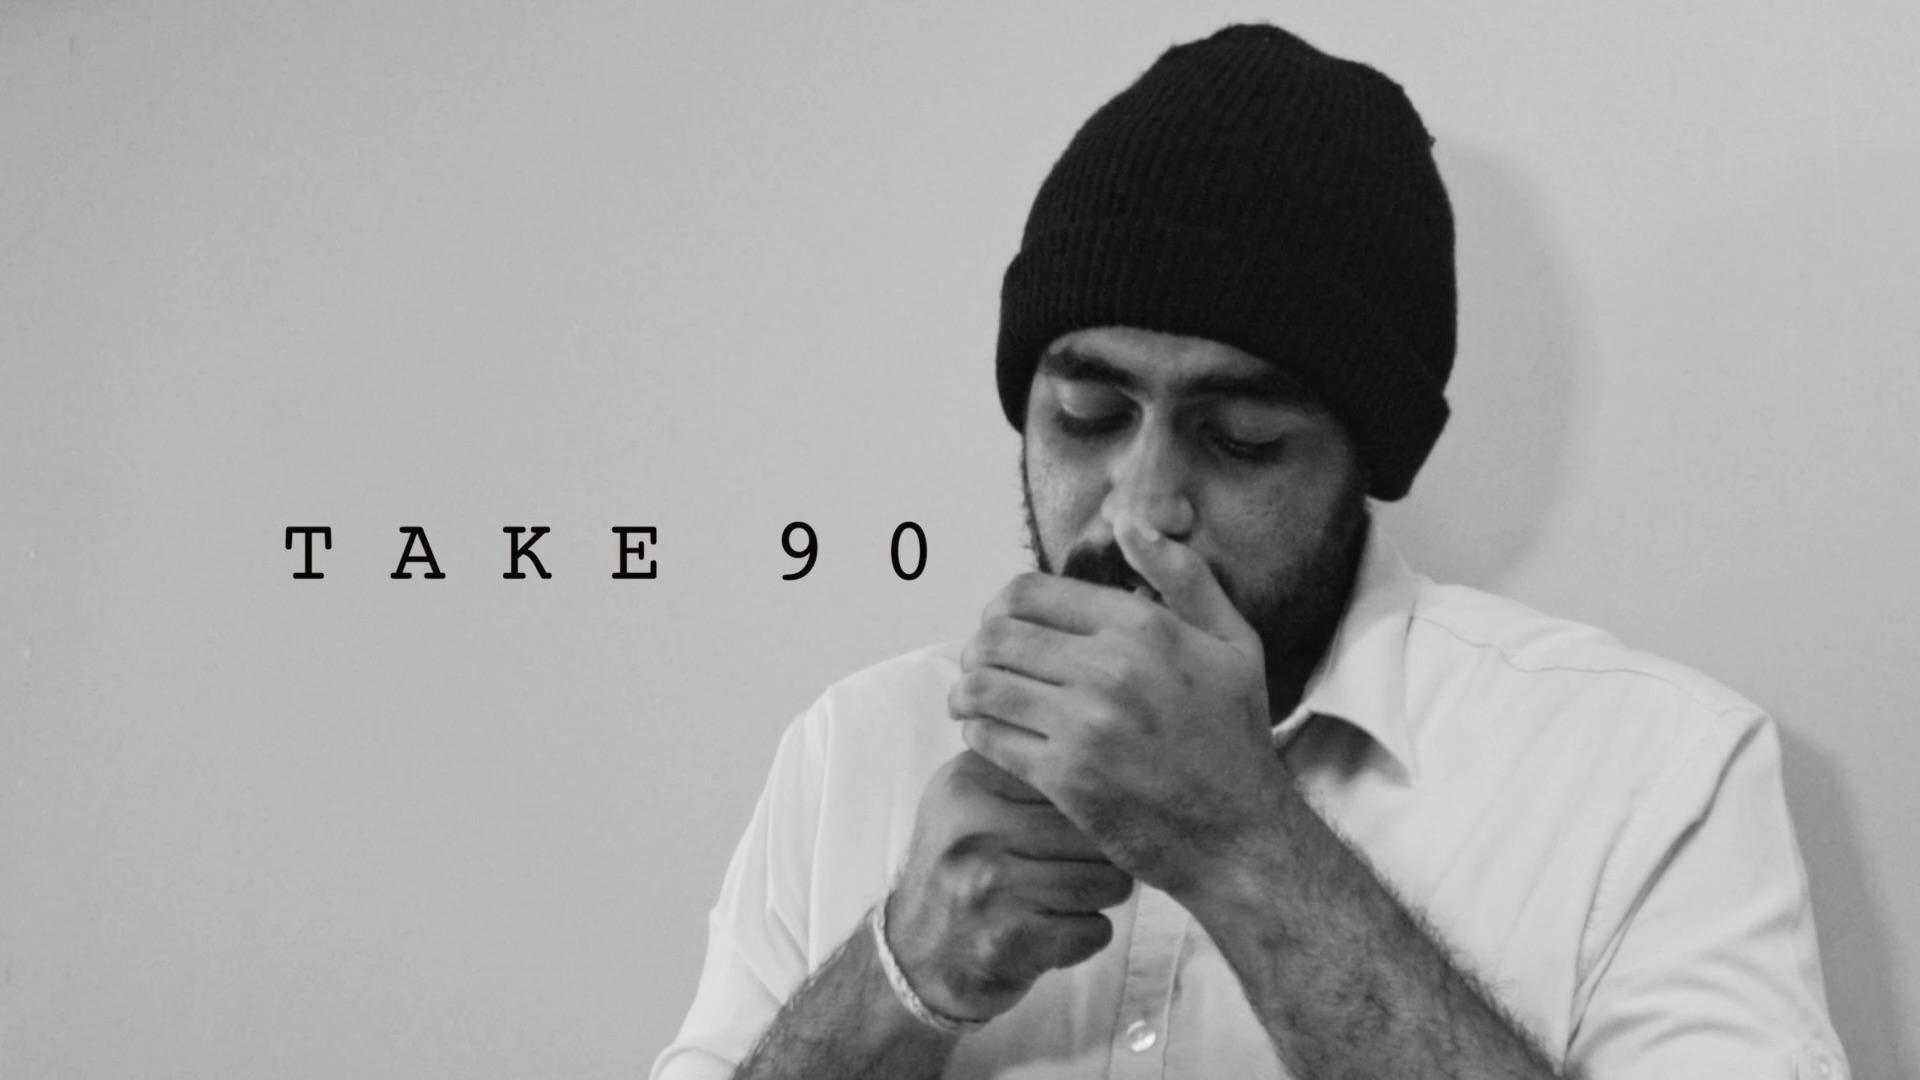 TAKE 90 | My RØDE Reel 2020